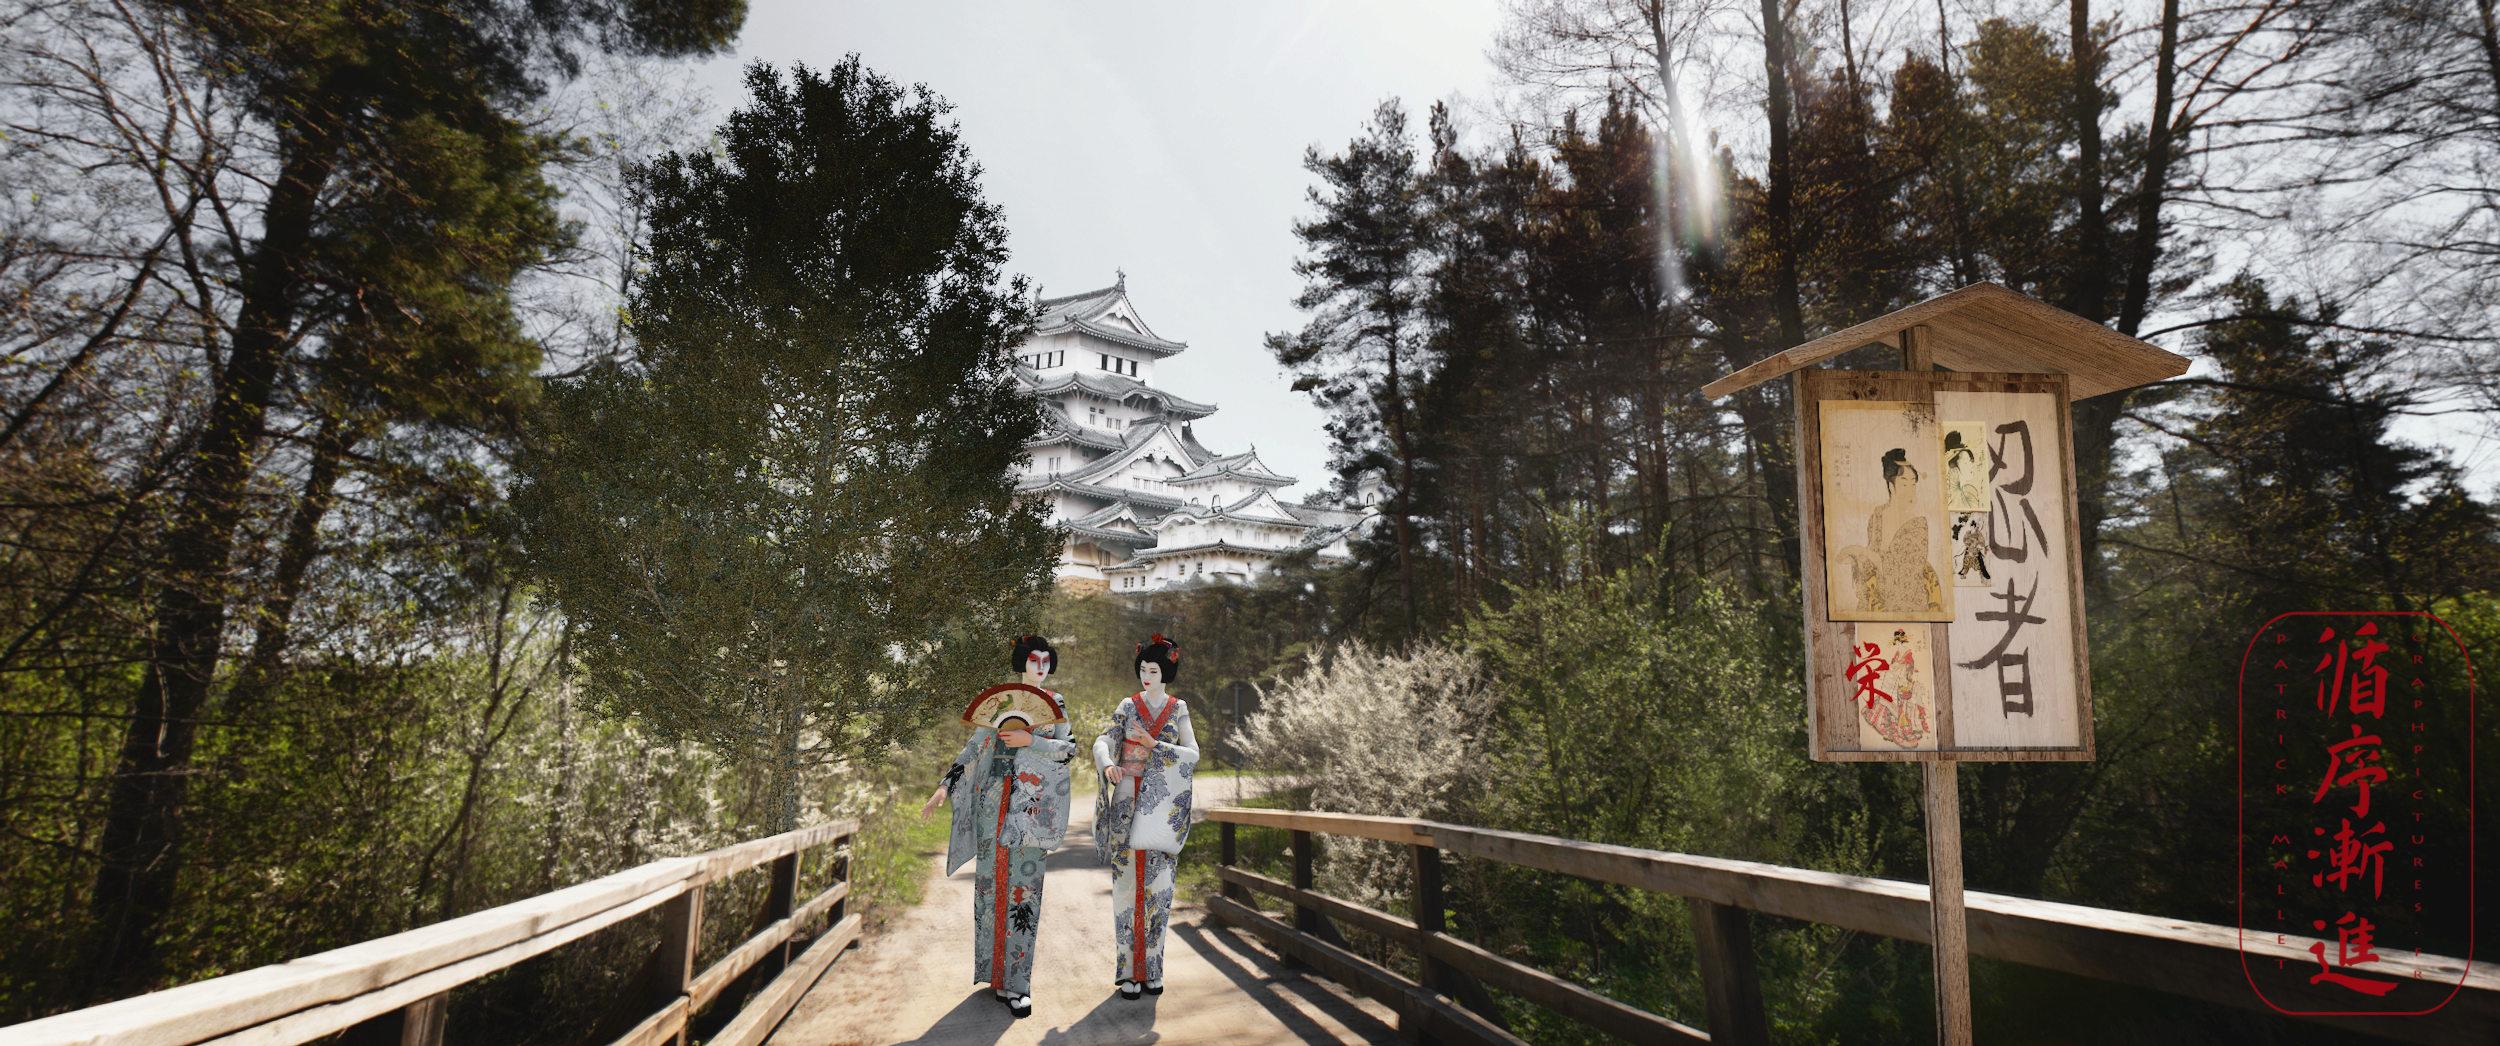 ma vision du  japon - Page 3 Geisha10